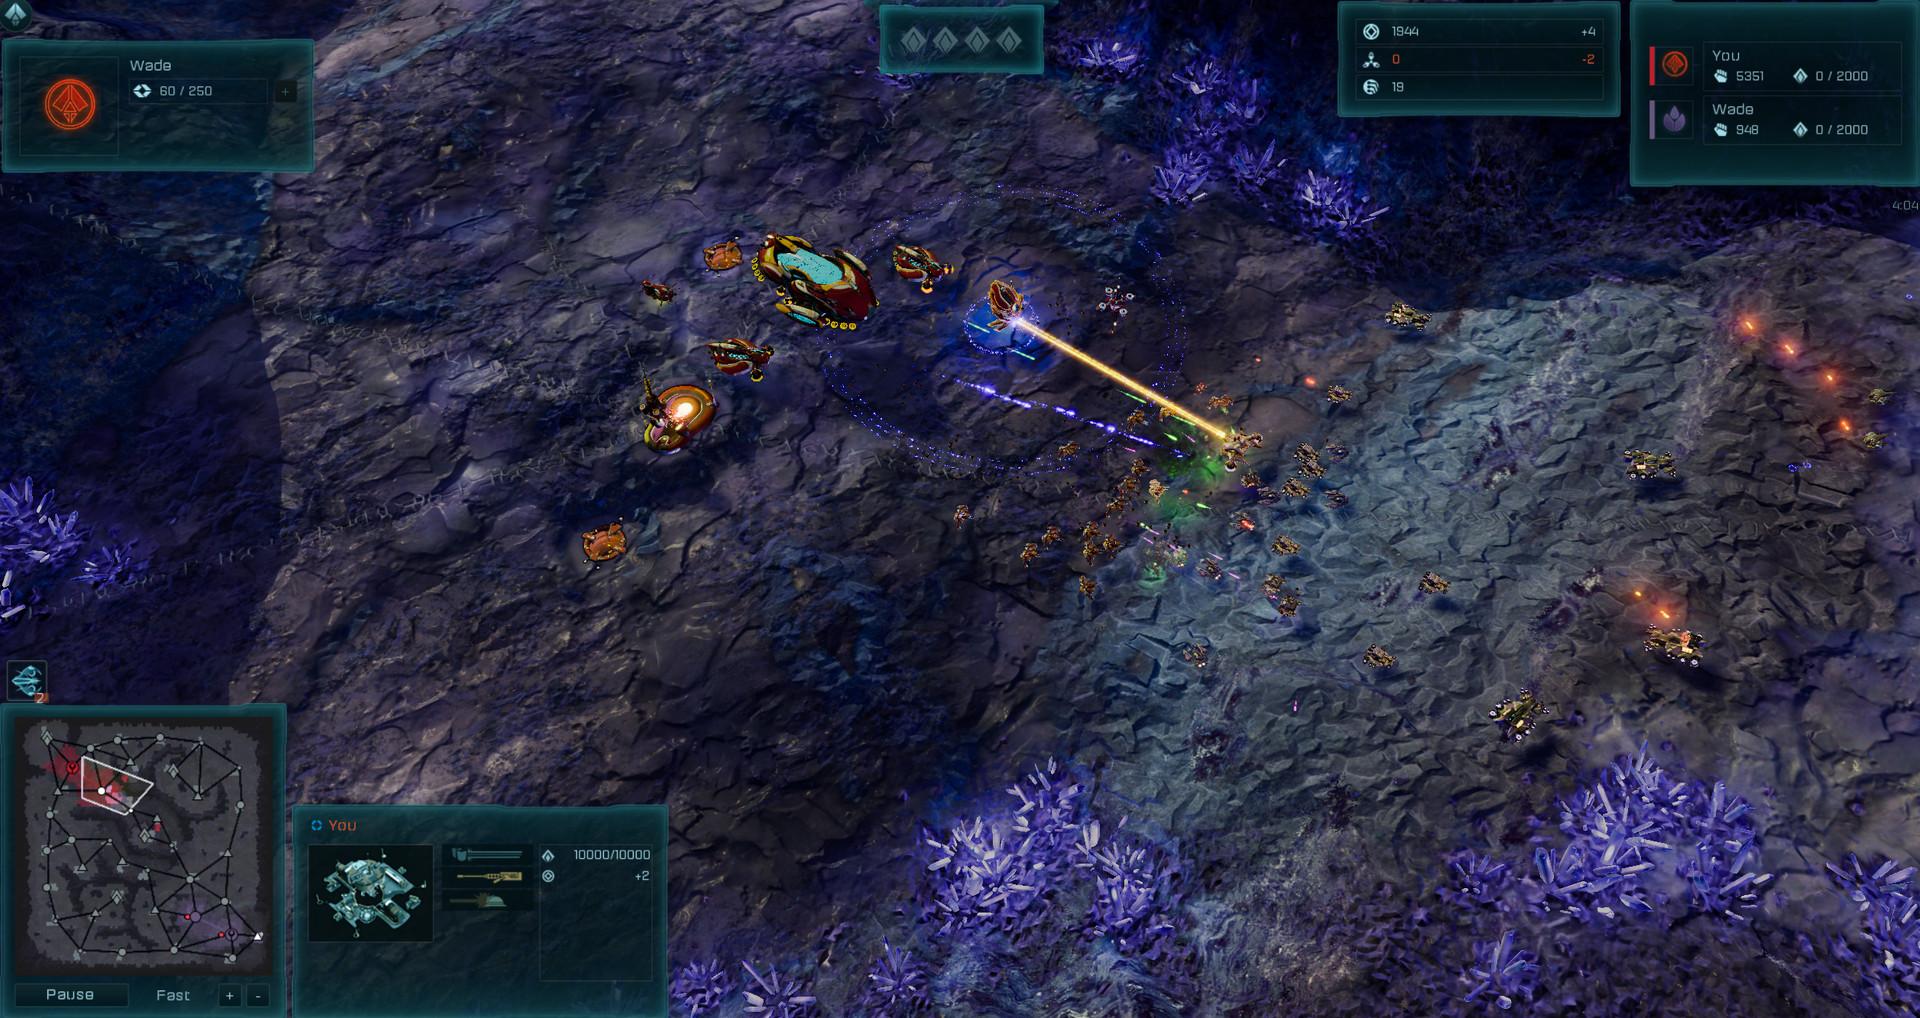 Ashes of the Singularity: Escalation Screenshot 3